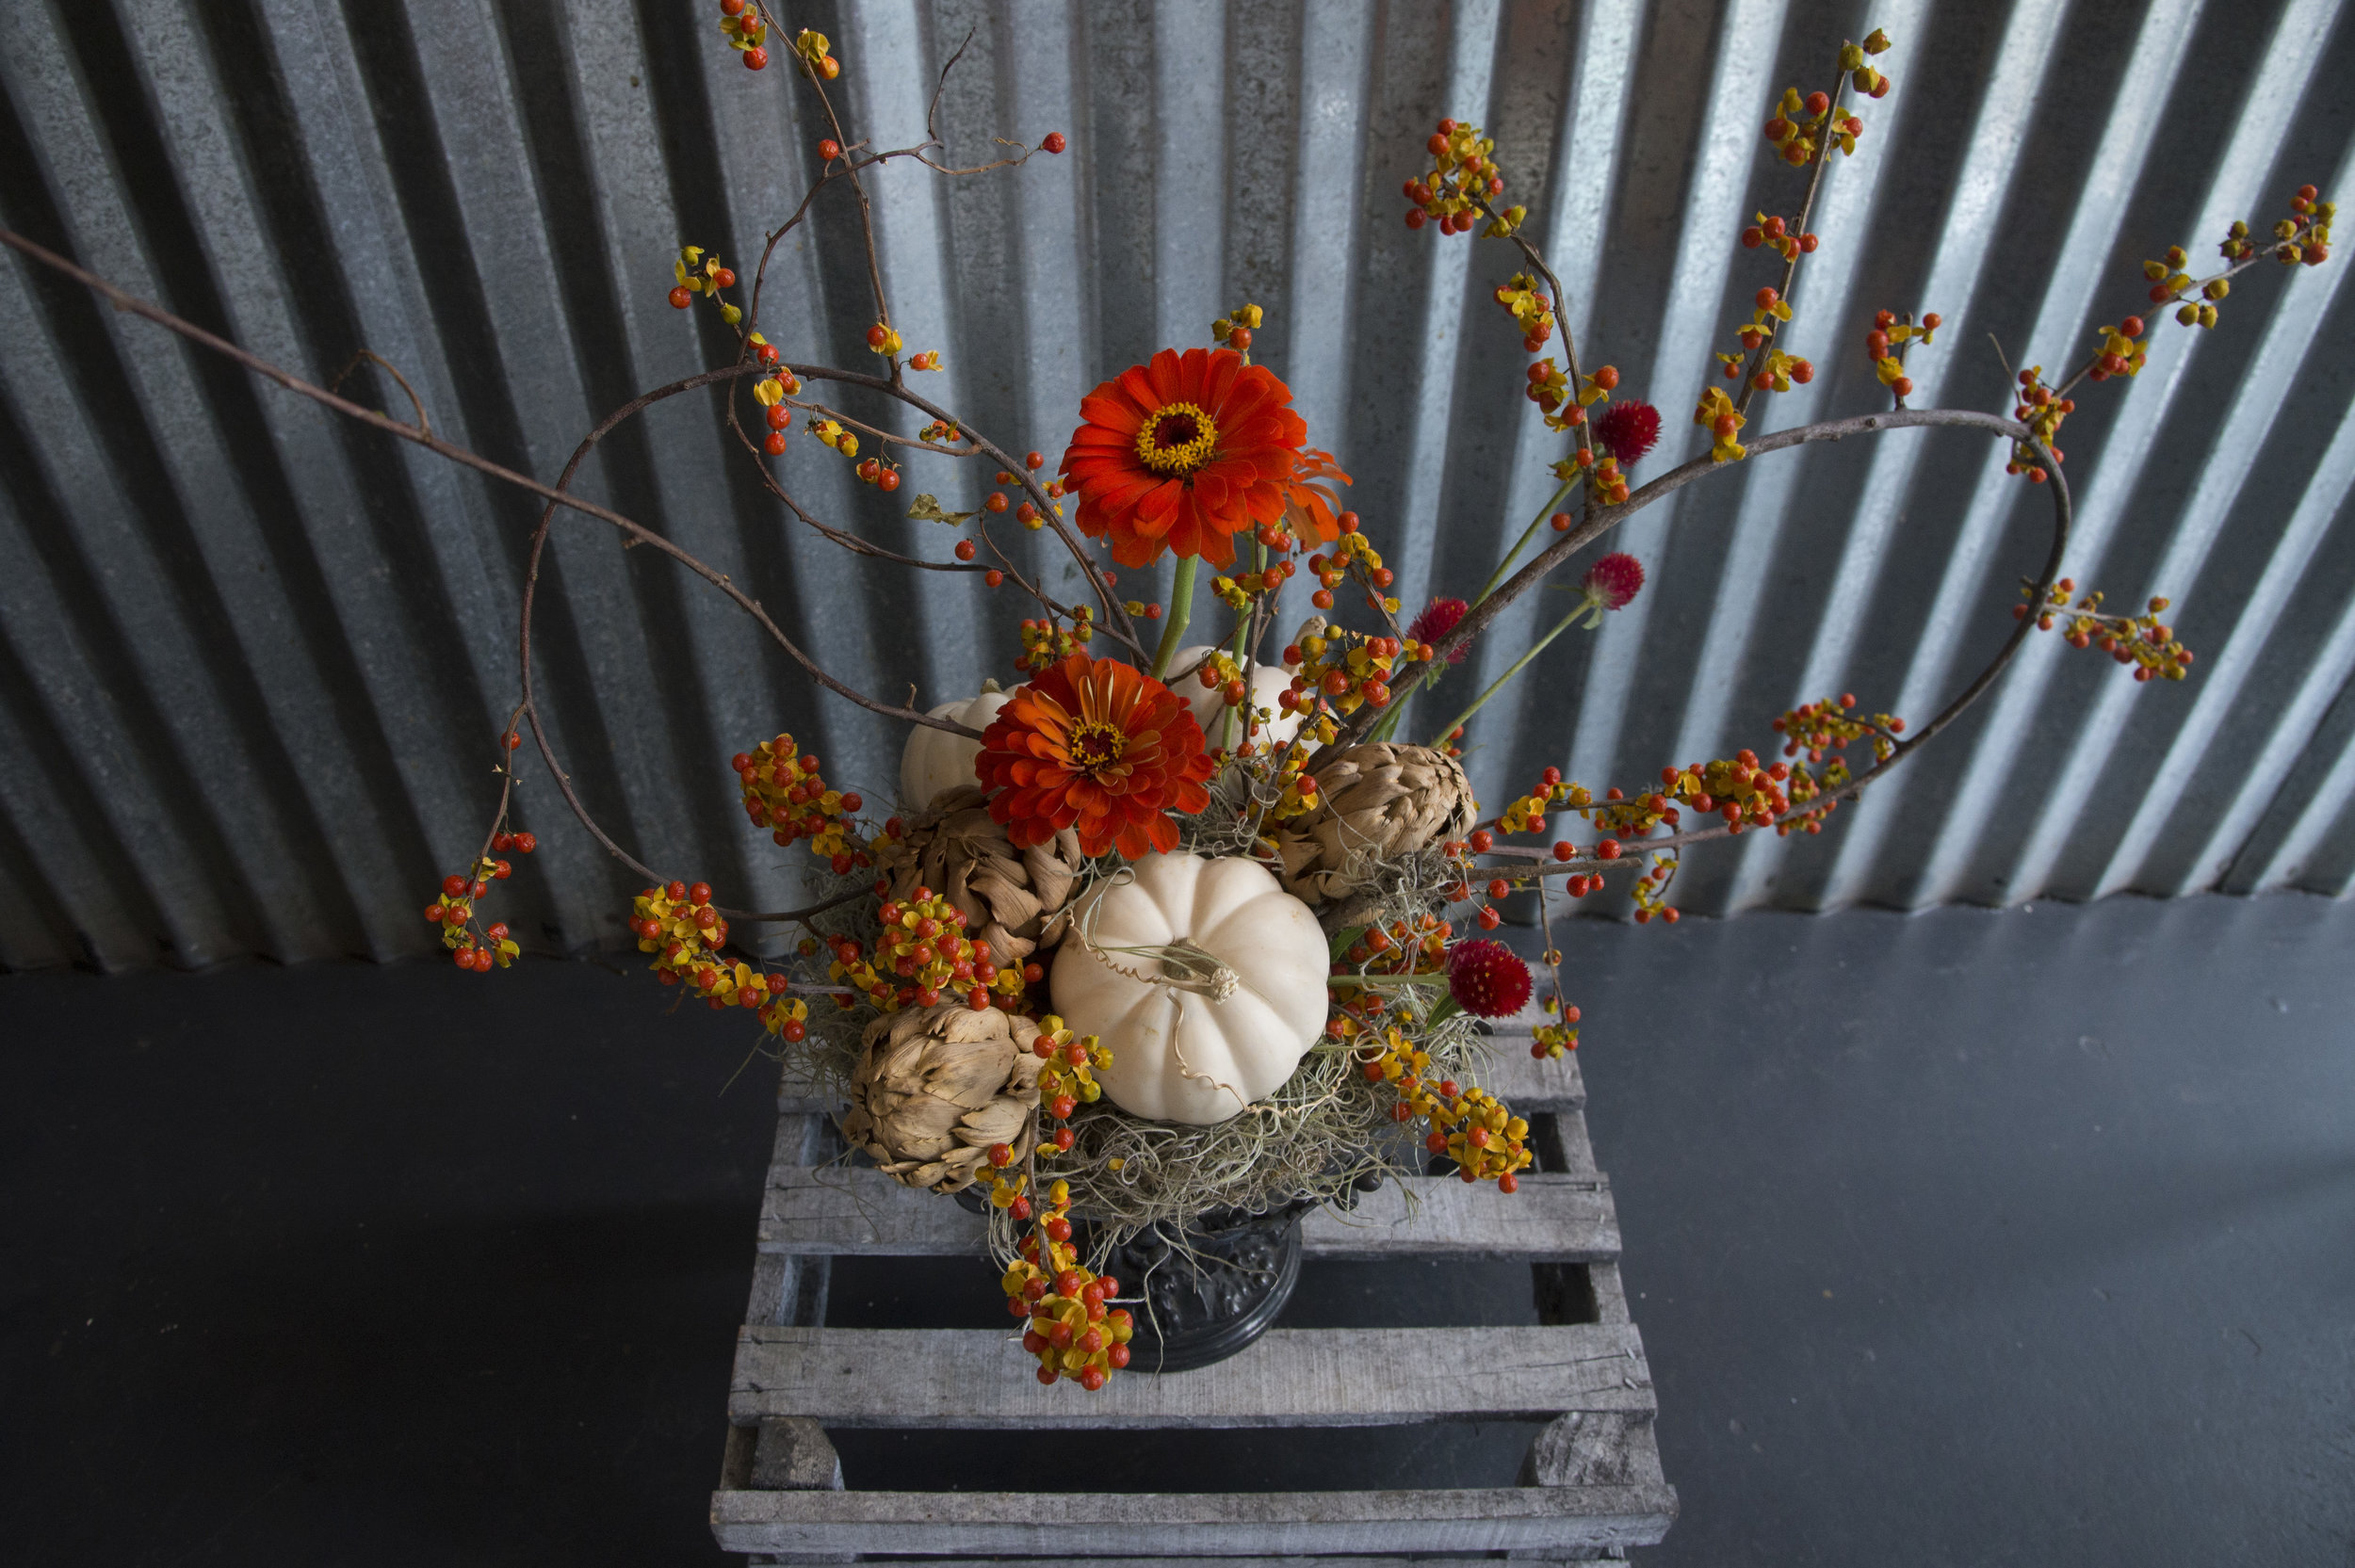 pppreserved centerpiece mitchs flowers new orleans florist denys mertz.jpg